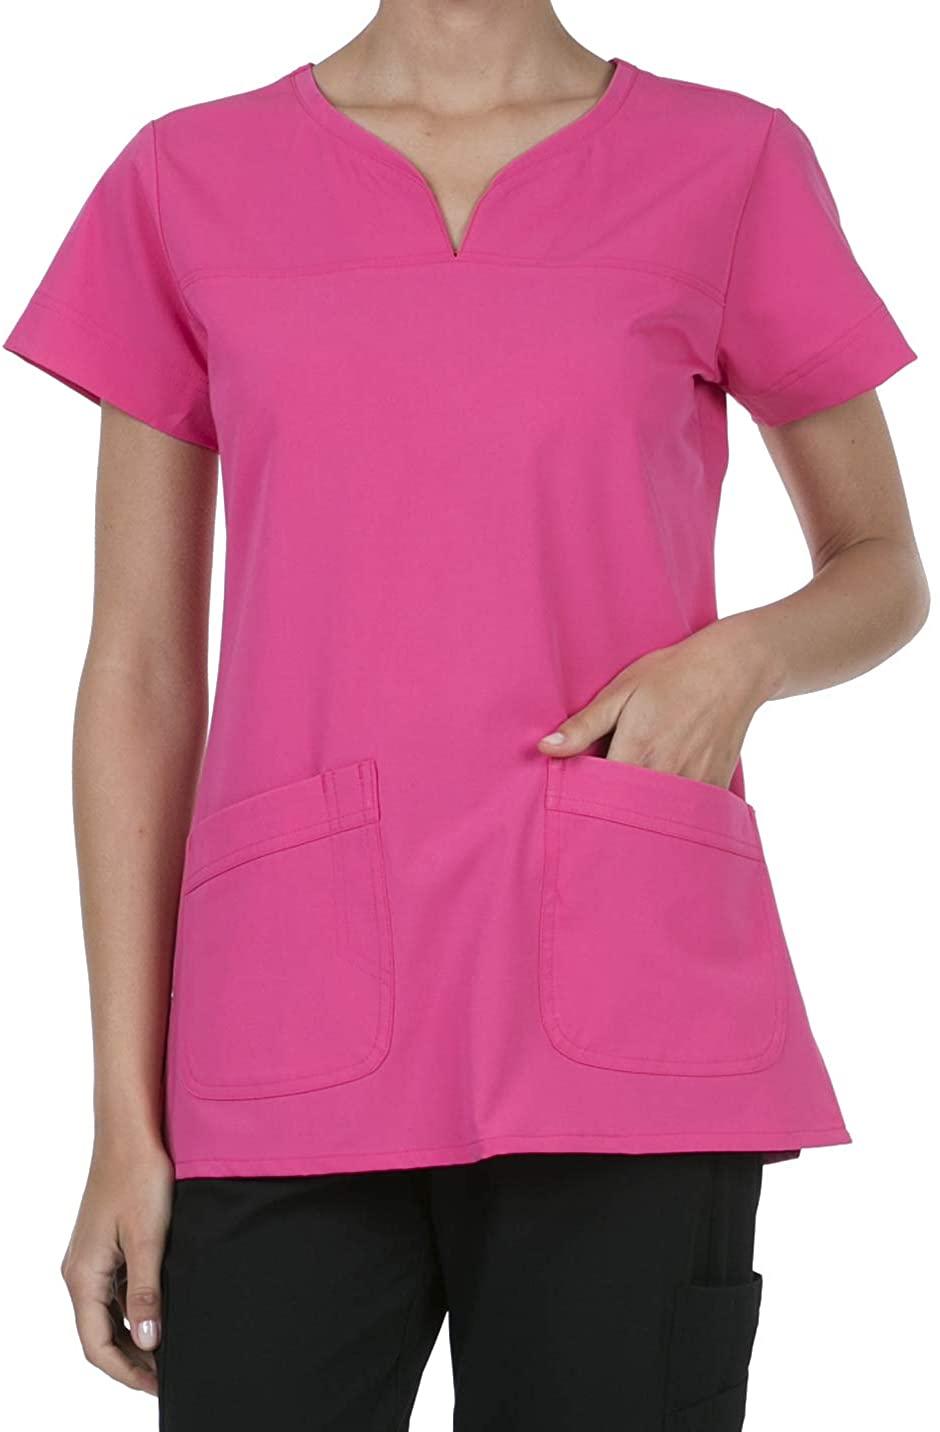 8045 Women's Uniform Scrubs Medical 2 Pocket Scrub Top Rose XXS